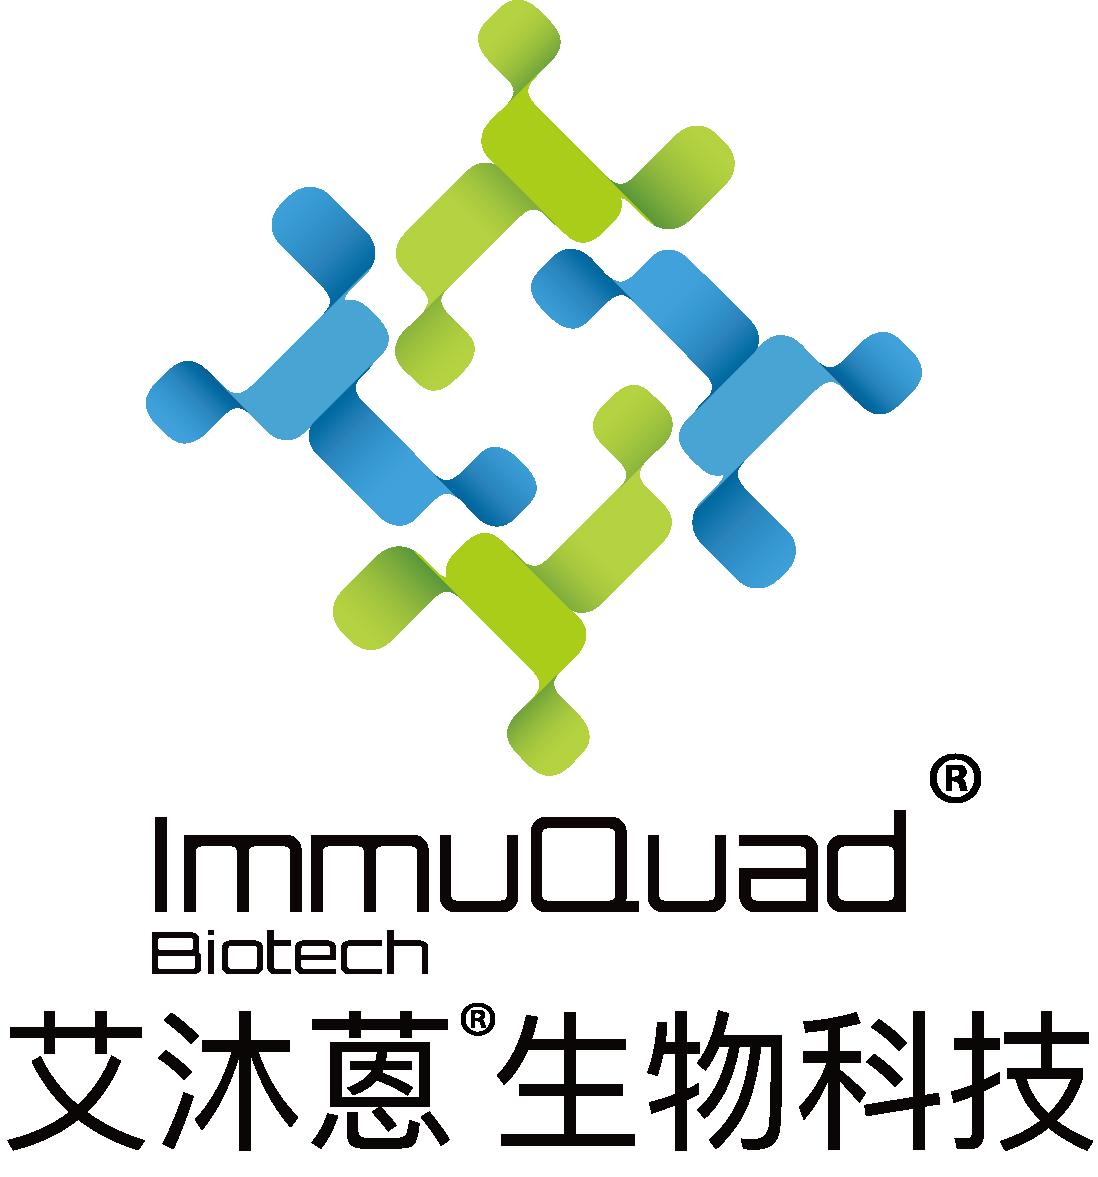 B细胞(BCR)和抗体免疫组库全长测序Ig-Seq